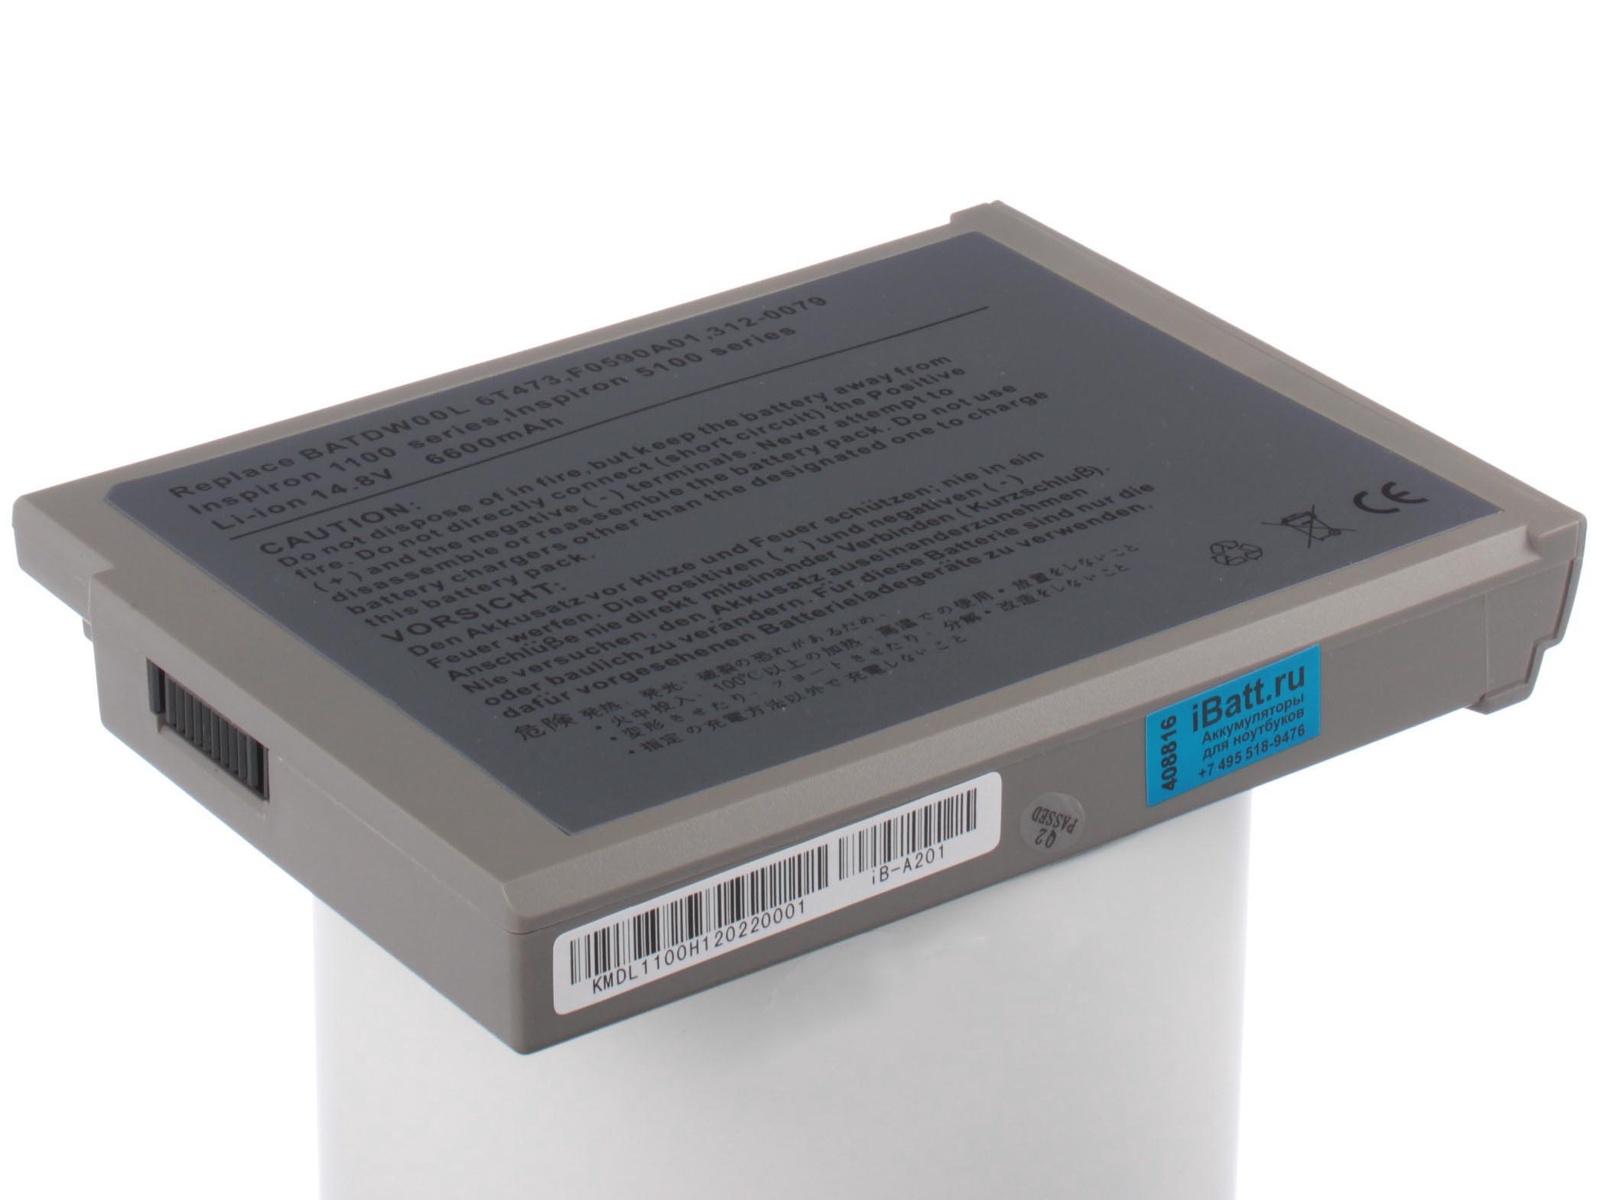 Аккумулятор для ноутбука iBatt для Dell Inspiron 5110, Inspiron 5100, Inspiron 1100, Inspiron 1150, PP01, Latitude 100L, Inspiron 5160, Inspiron 5150, Inspiron 5110-3715, PP08L, Inspiron 5110-7475, Inspiron 5110-8255 pitatel bt 203 аккумулятор для ноутбуков dell inspiron 1100 5100 5150 5160 latitude 100l